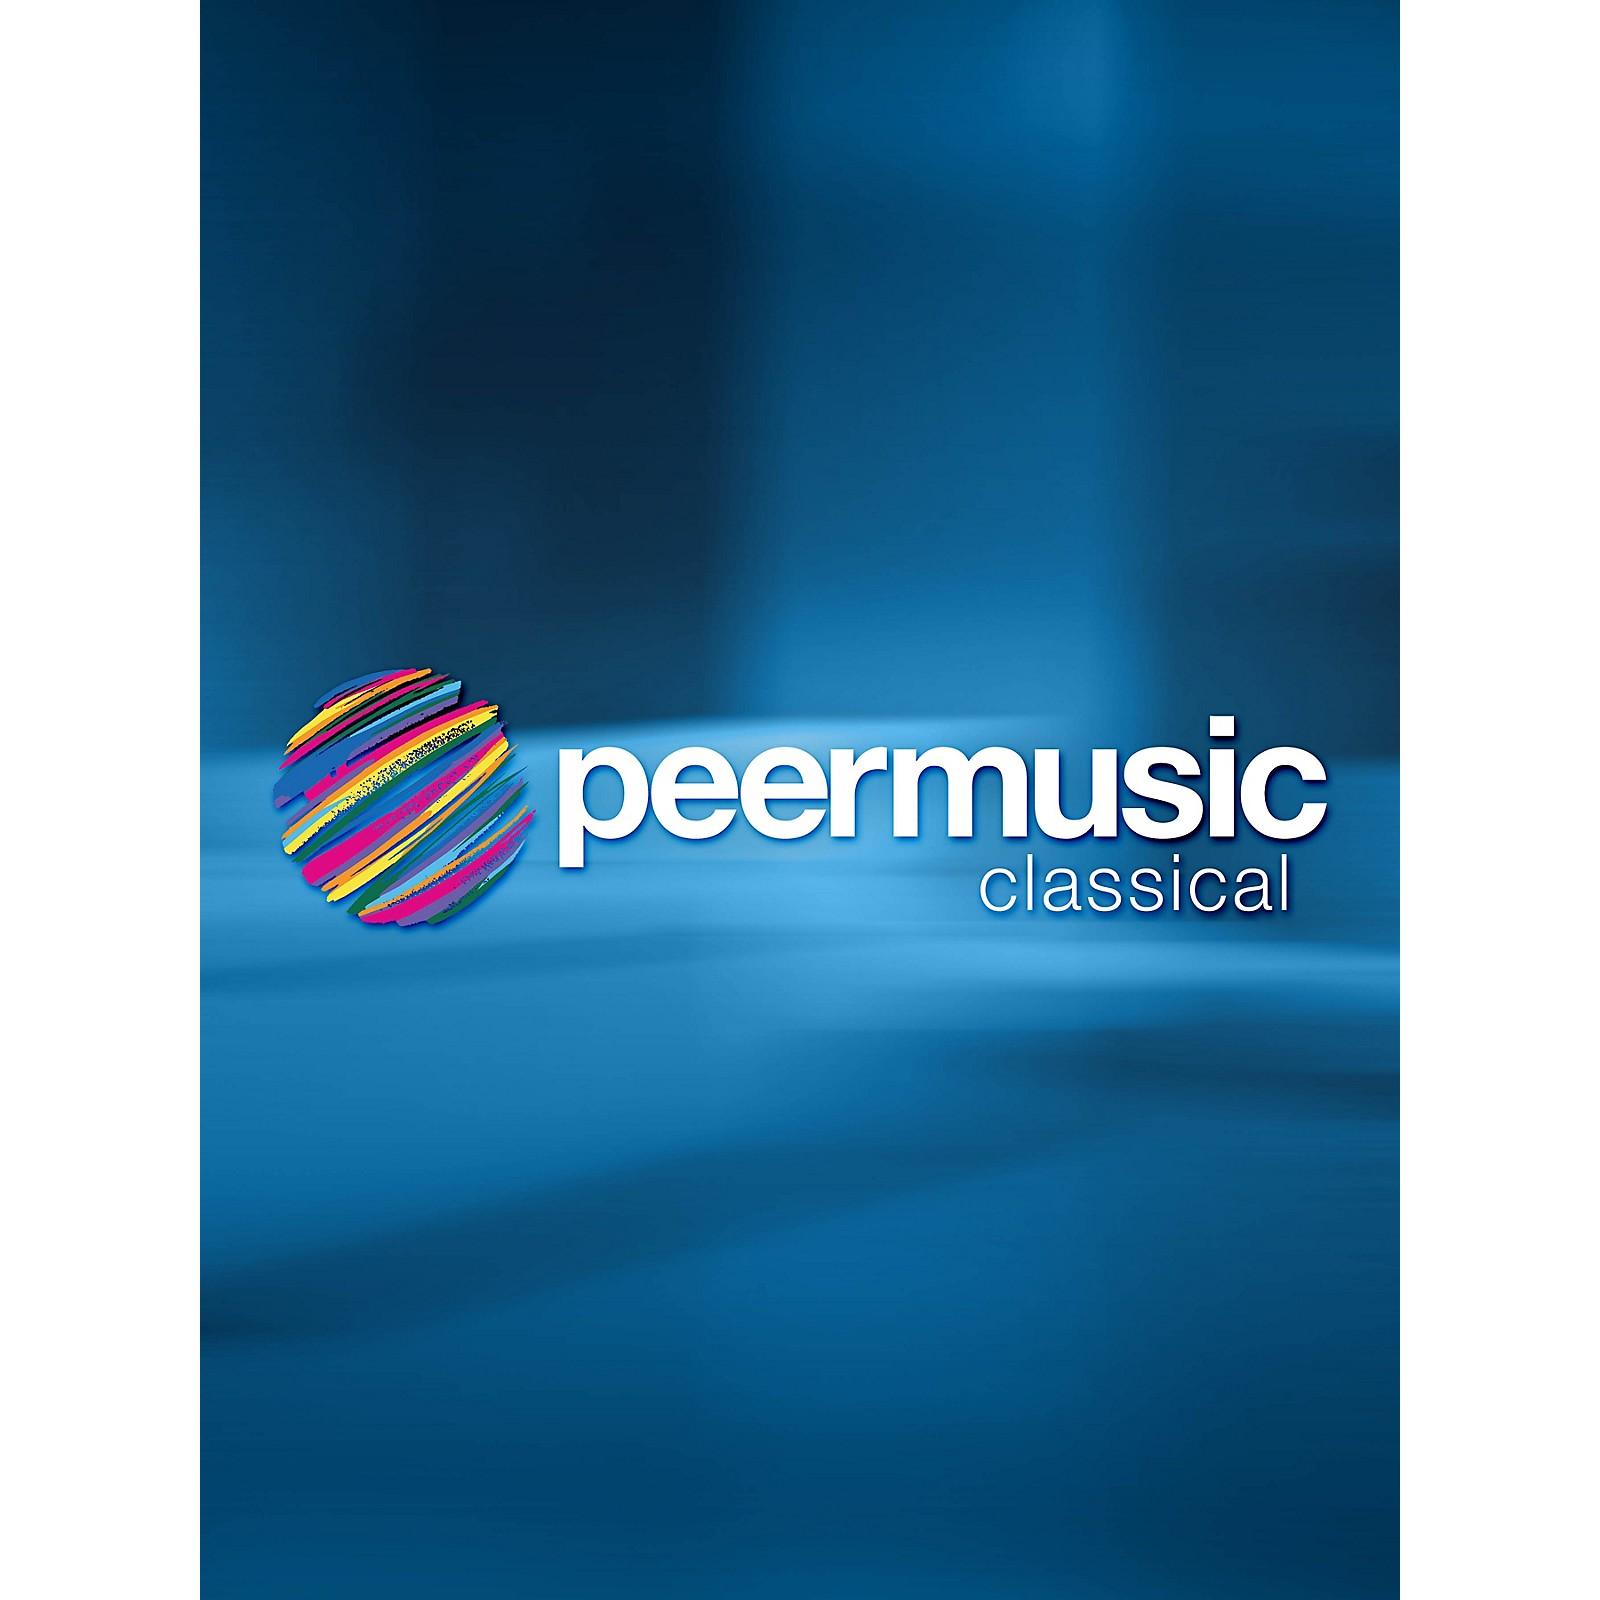 Peer Music Four Choruses for Three Tubas Peermusic Classical Book  by Franz Schubert Arranged by Kenneth Singleton